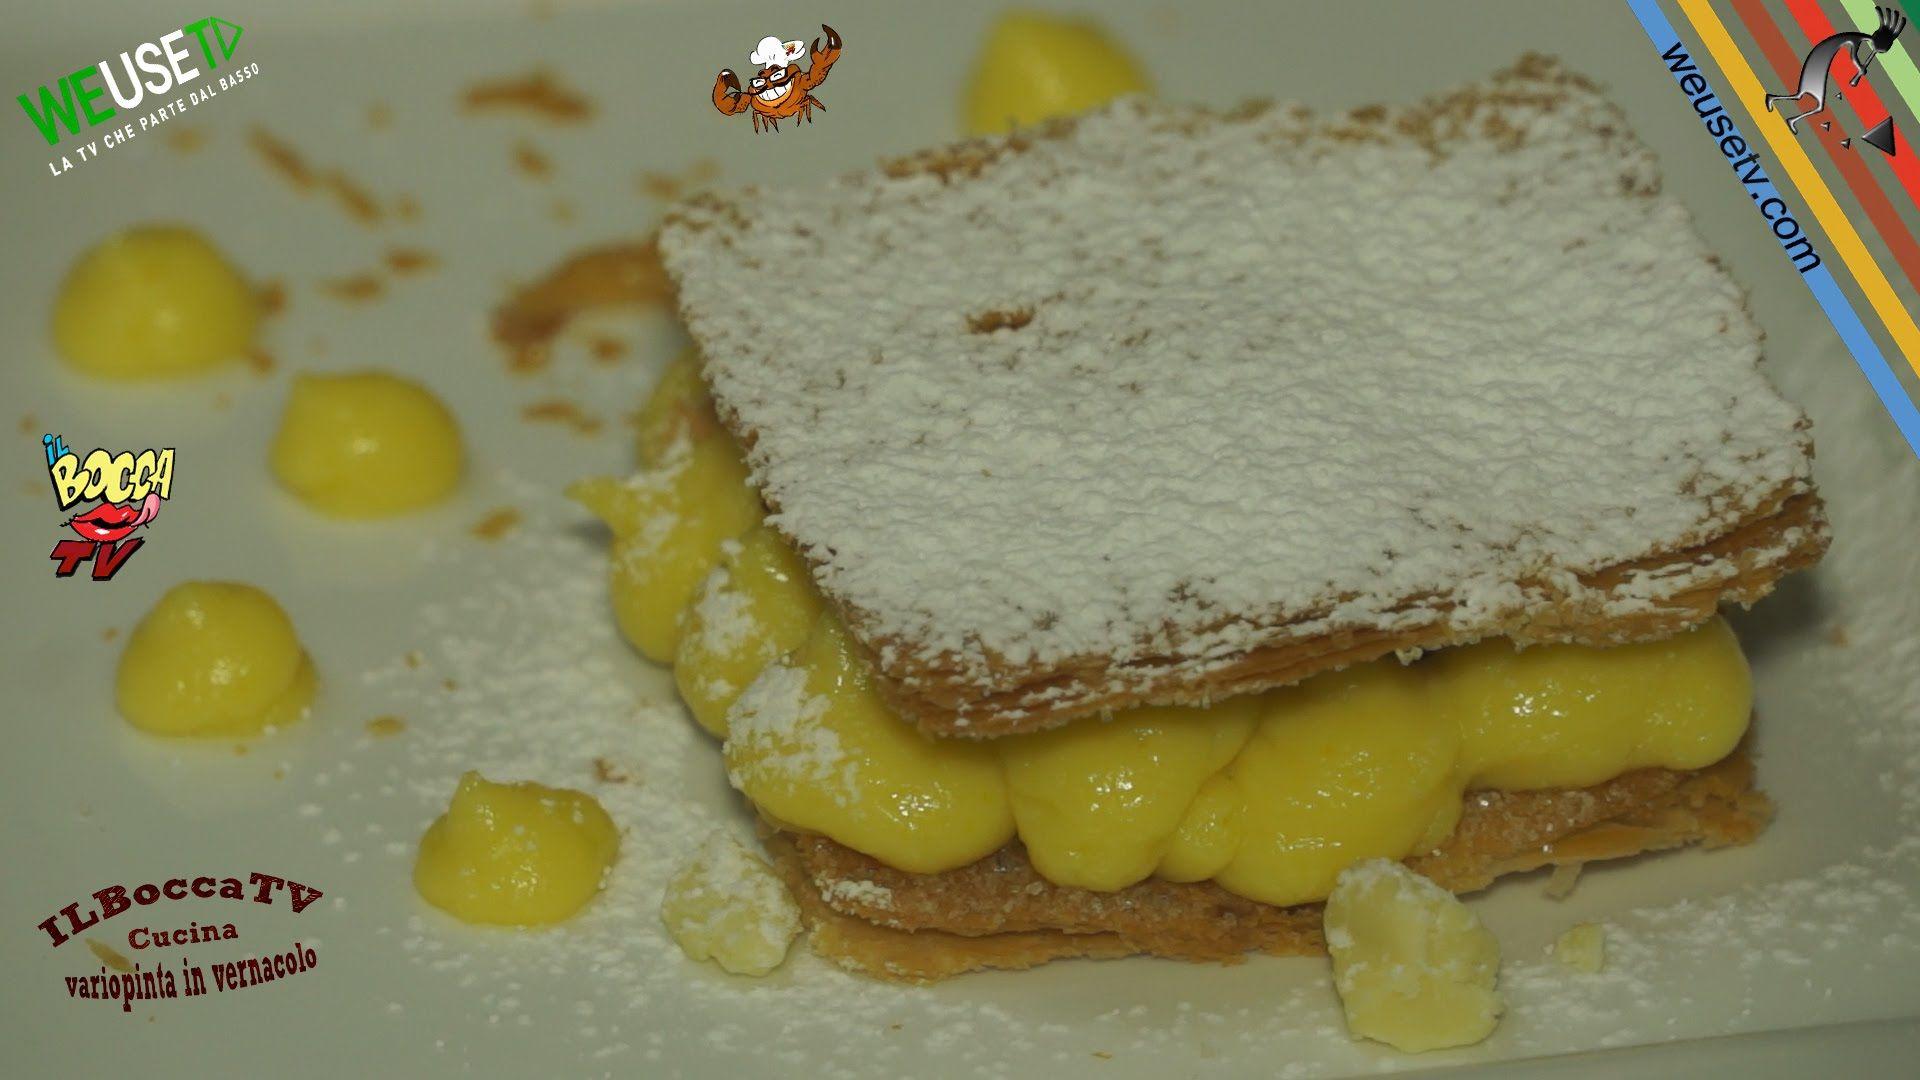 #dolci #dessert #tutorial #videoricette #Millefoglie con crema all'arancio, #cioccolato e #mirtilli #weusetv #ilboccatc #cucinatoscana #laveracucinatoscana